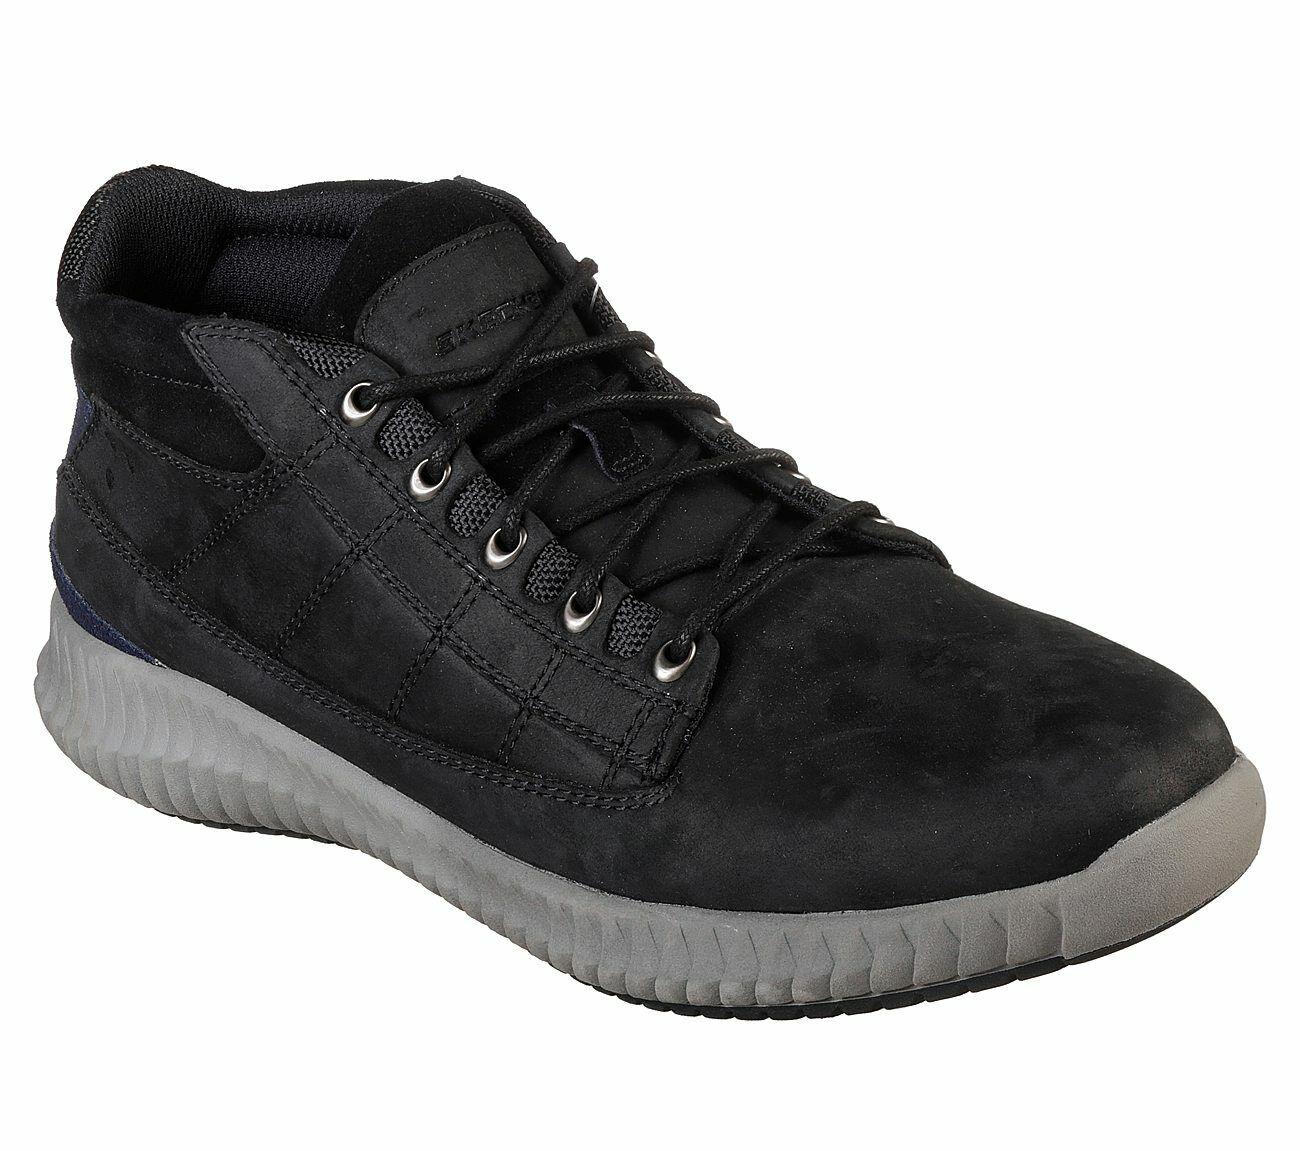 NEU SKECHERS Herren Sneakers Oxford Stil Memory Foam BRENDO 1VHFg